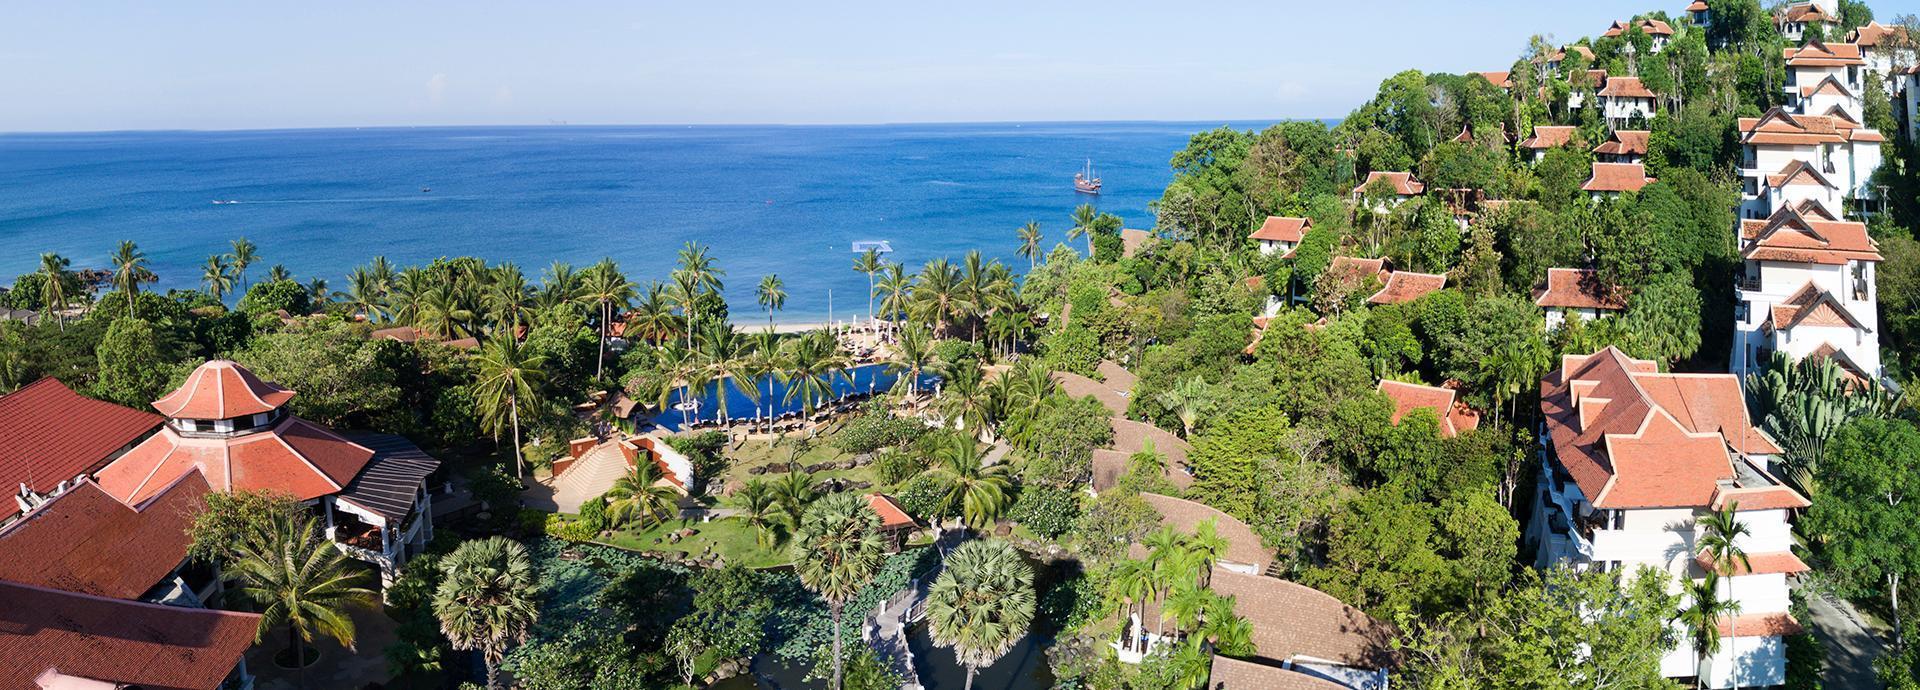 Rawi Warin Resort & Spa รวิวาริน รีสอร์ท แอนด์ สปา